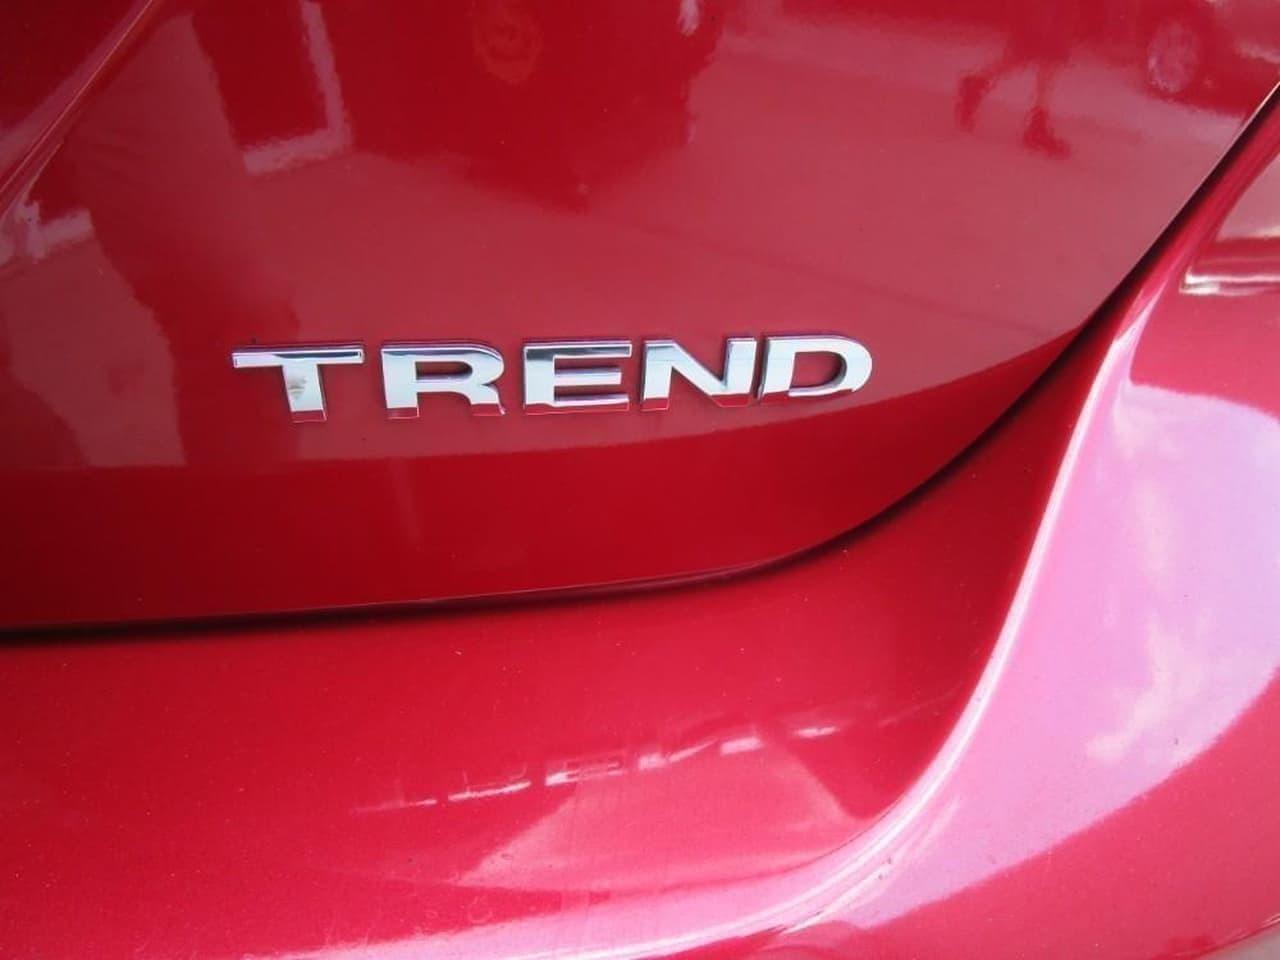 2012 Ford Focus LW MKII TREND Hatchback